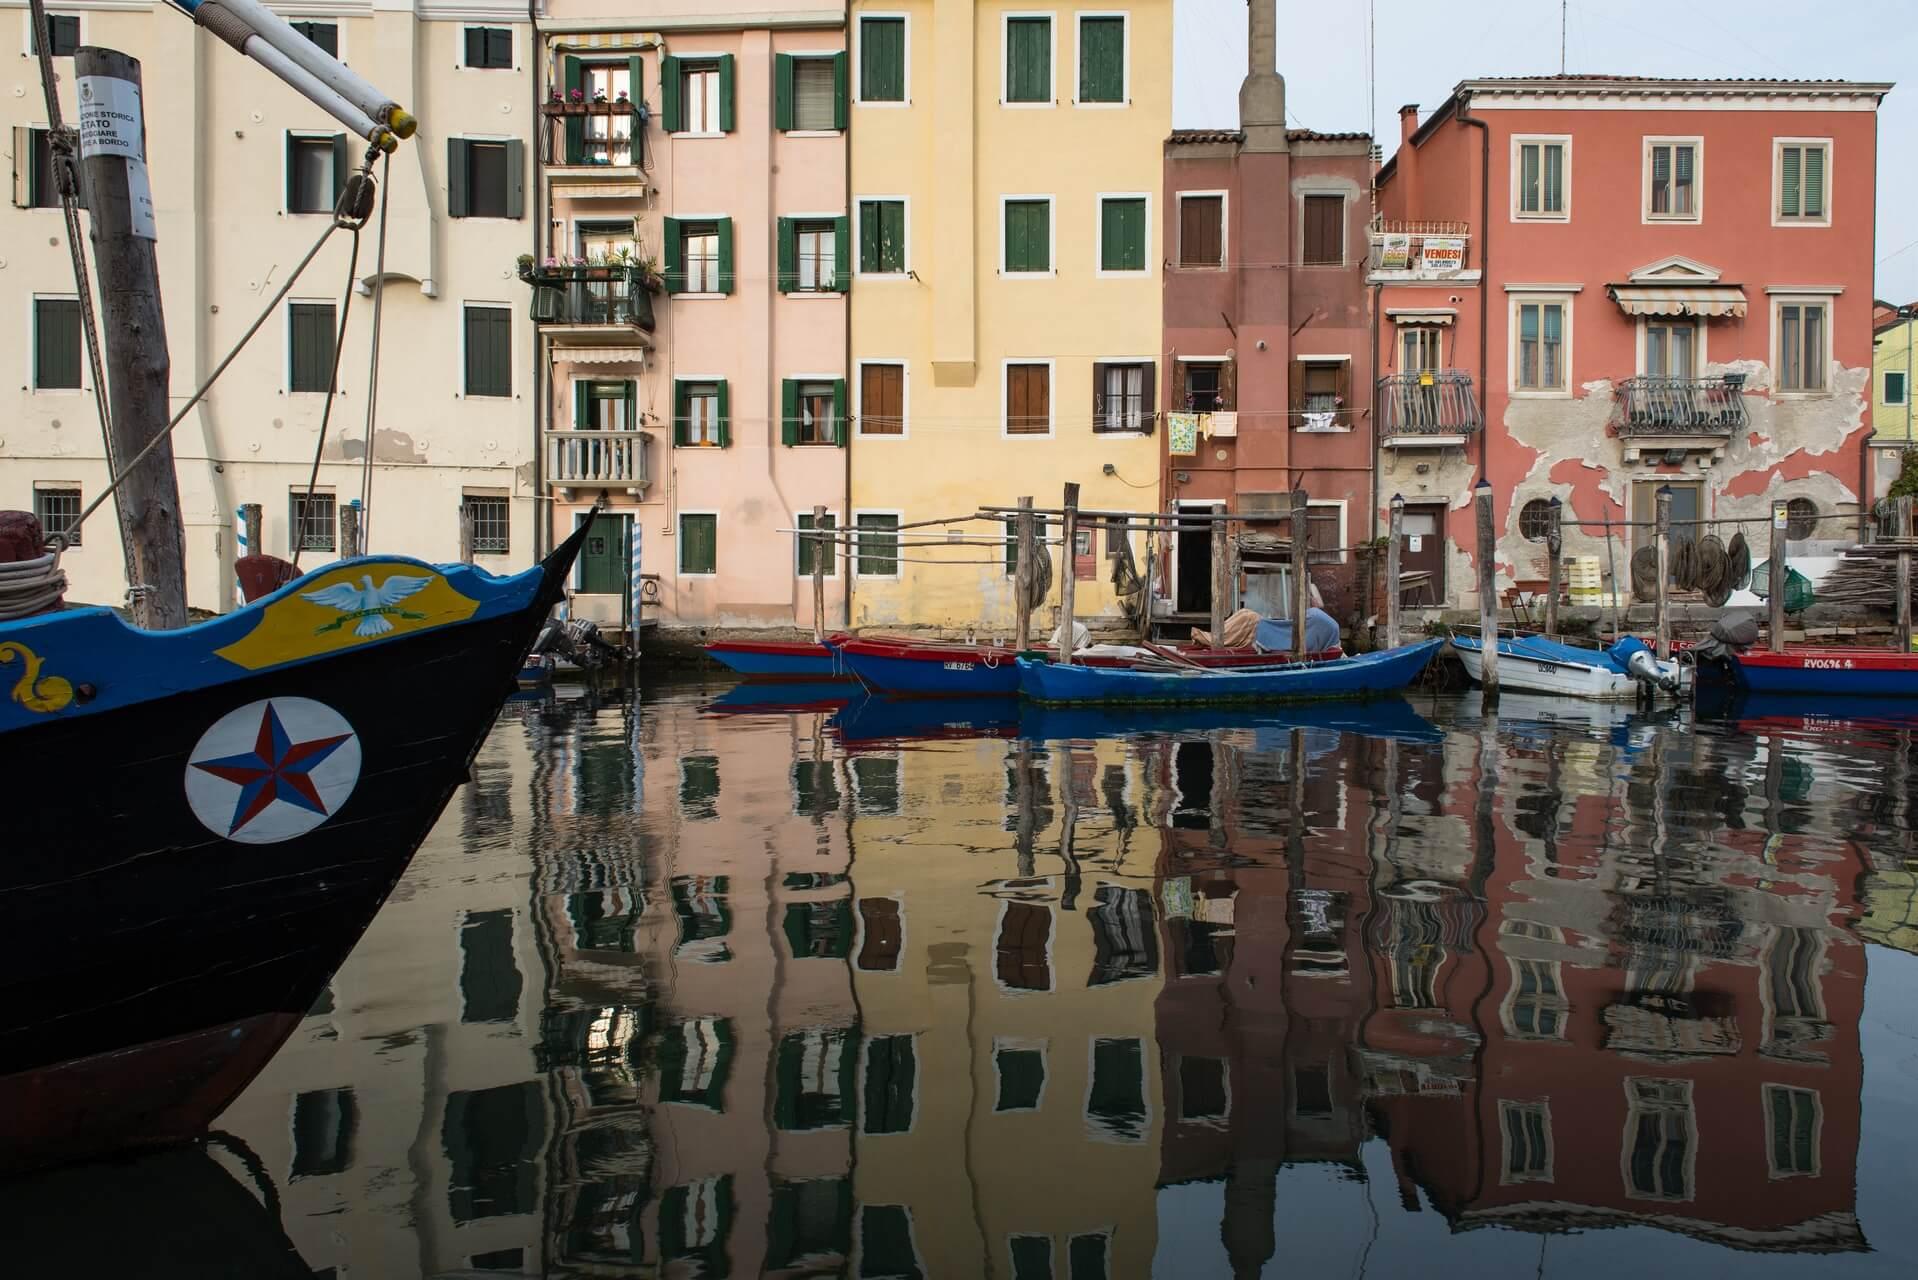 Italien: Laguna di Venezia - Chioggia, Fotograf: Steffen Lohse